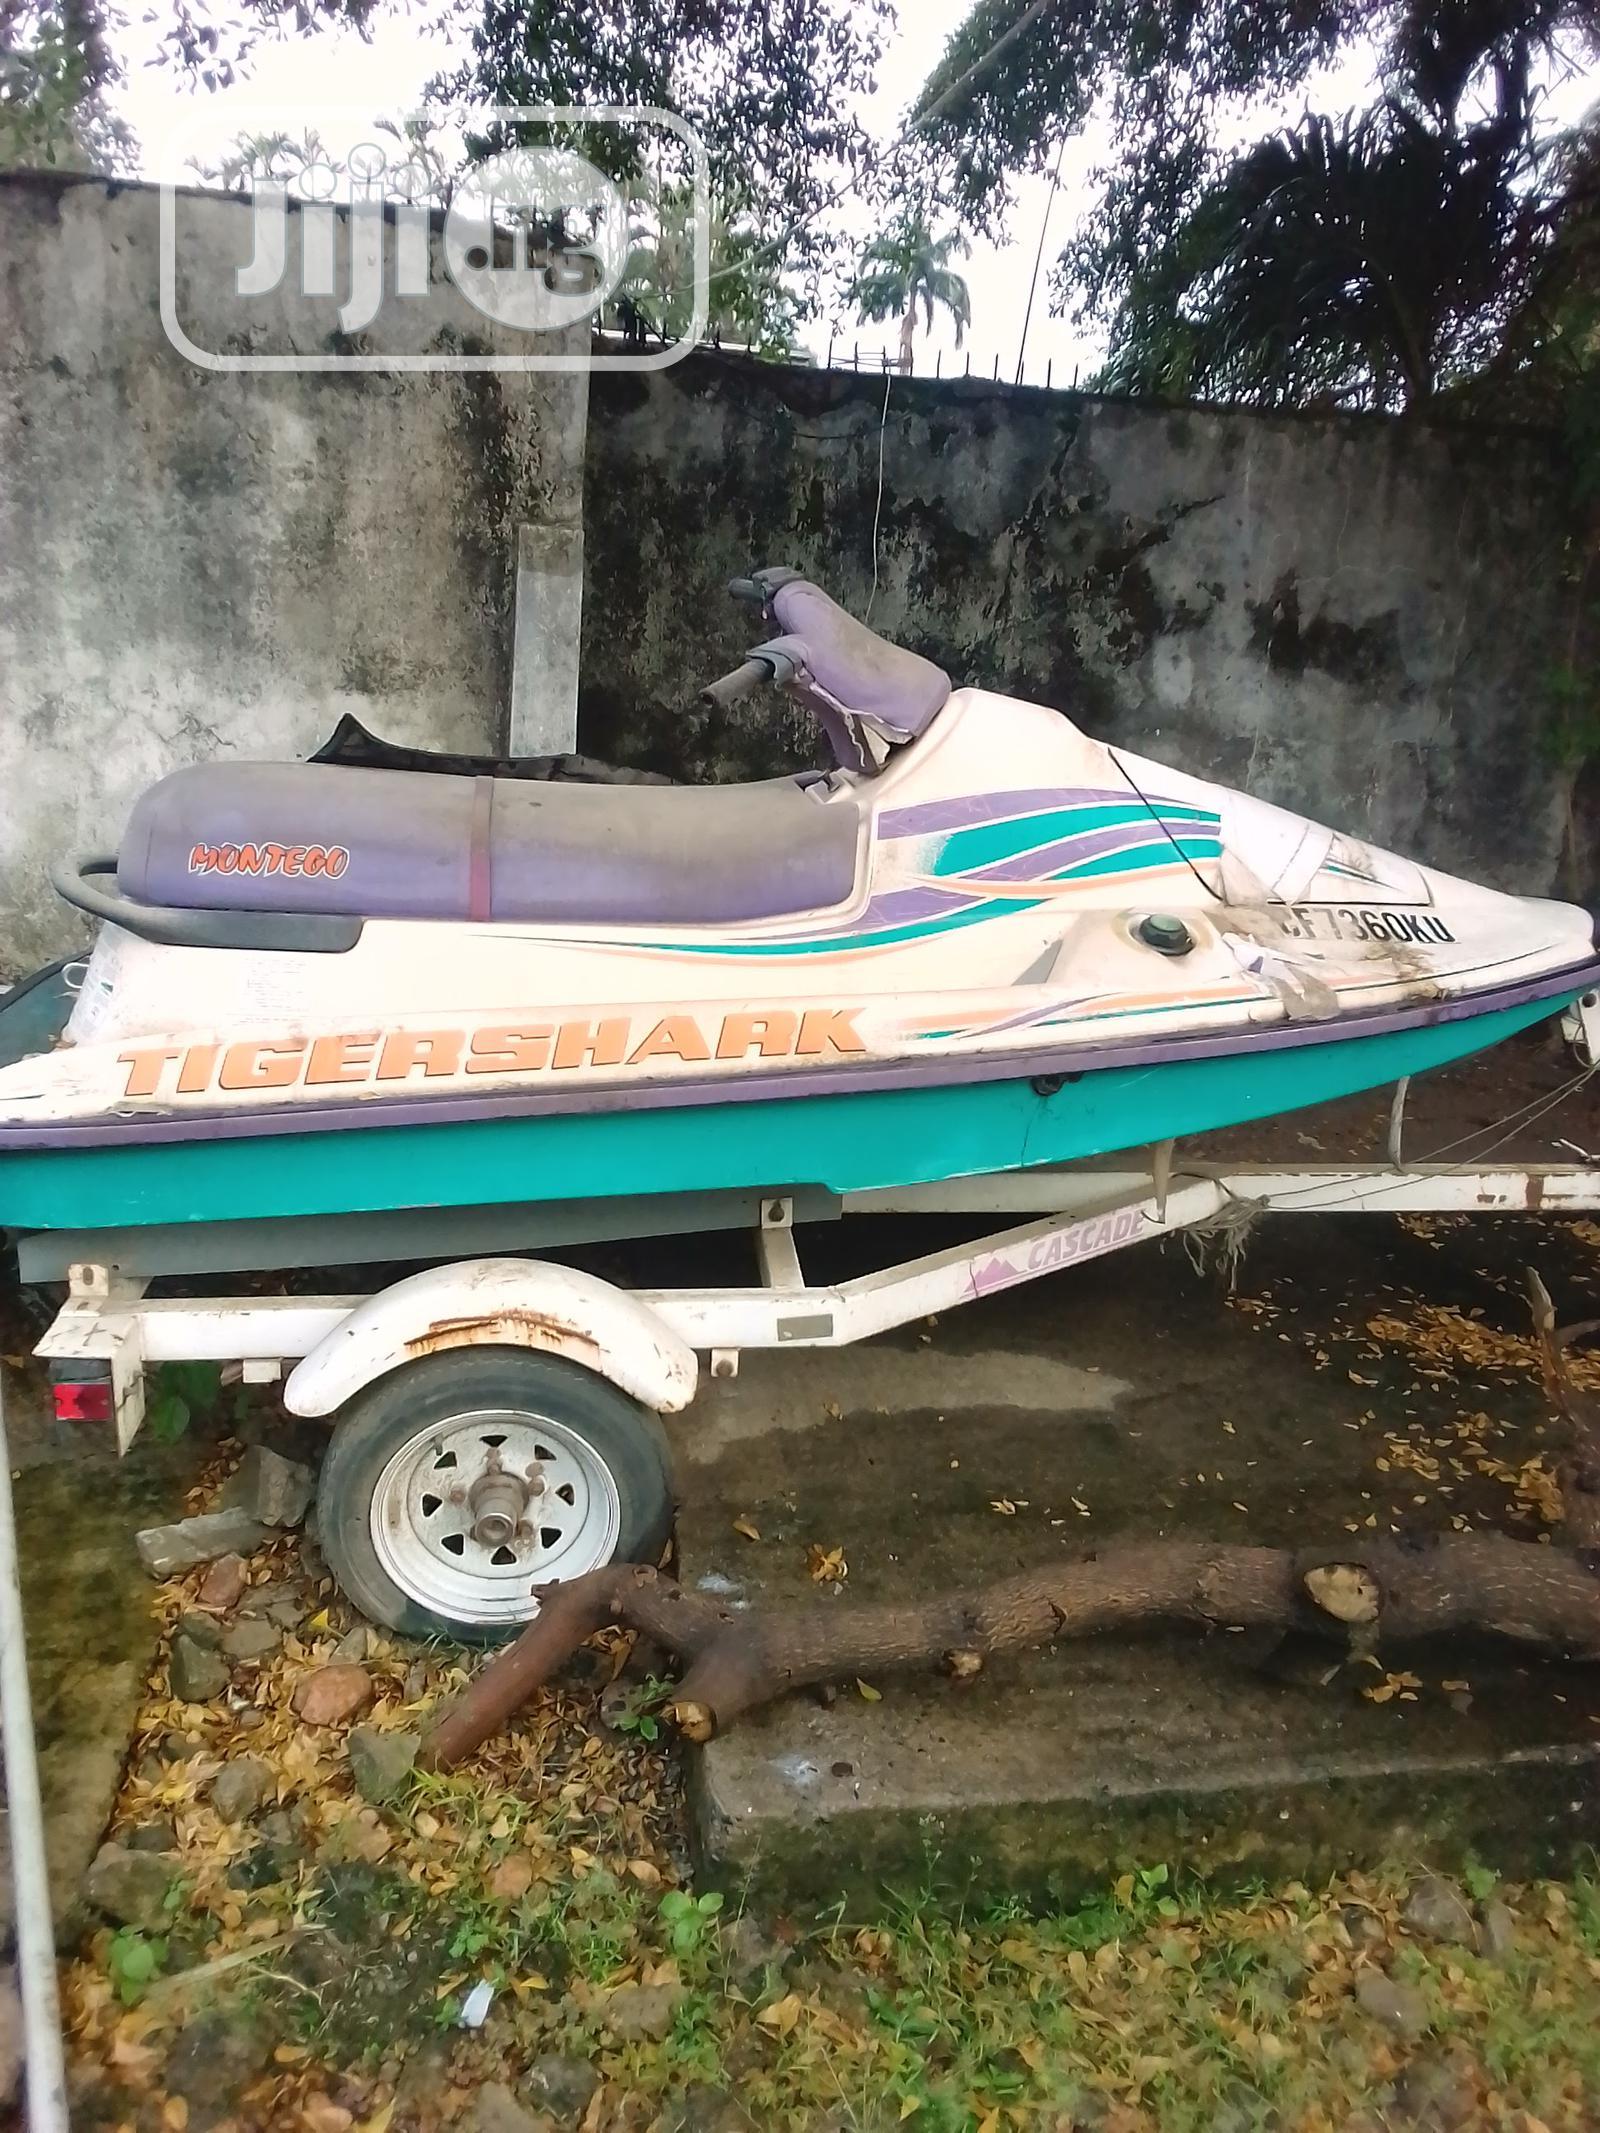 Jetski Boat Bike | Watercraft & Boats for sale in Ikeja, Lagos State, Nigeria